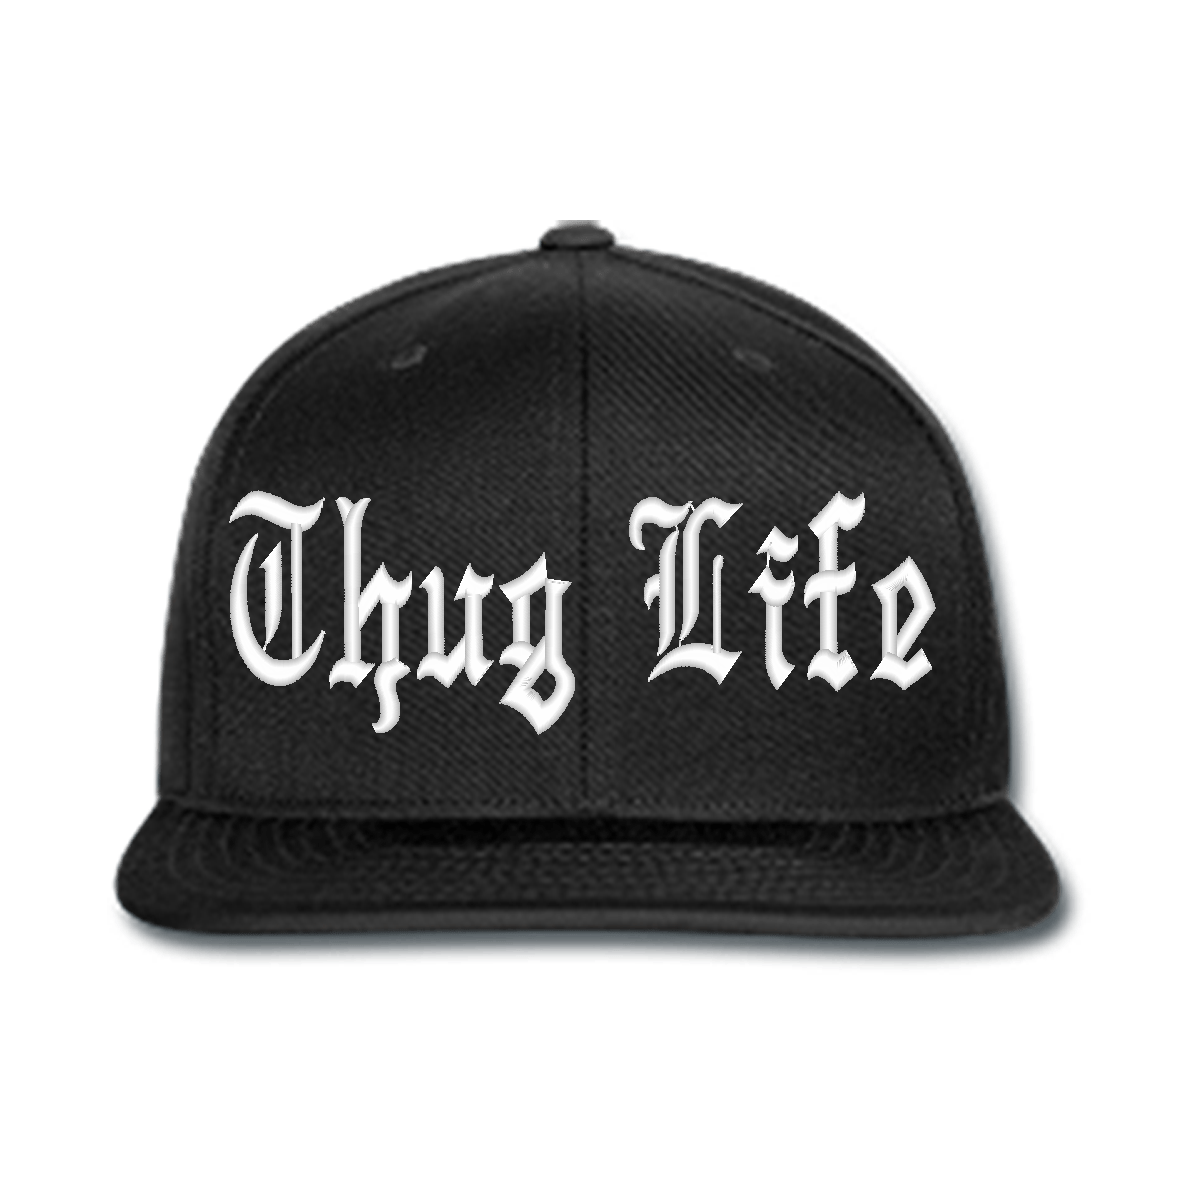 Thug Life Black Cap - Thug PNG